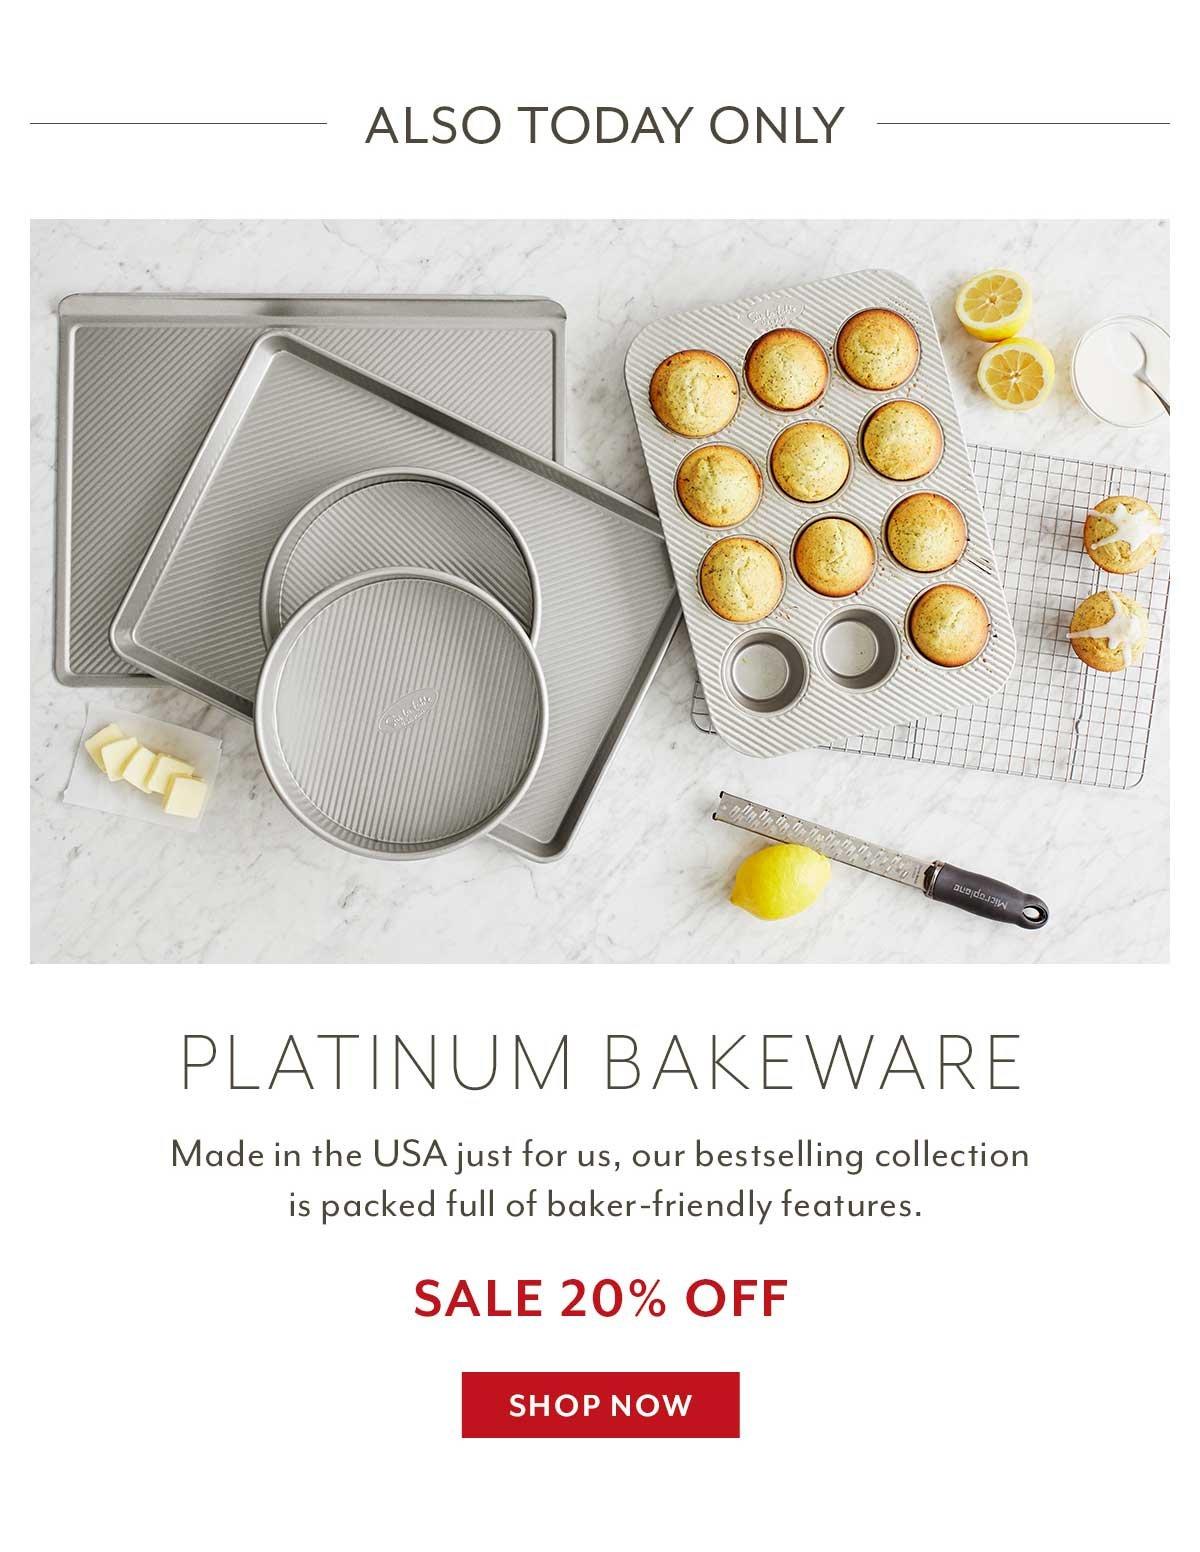 Platinum Bakeware